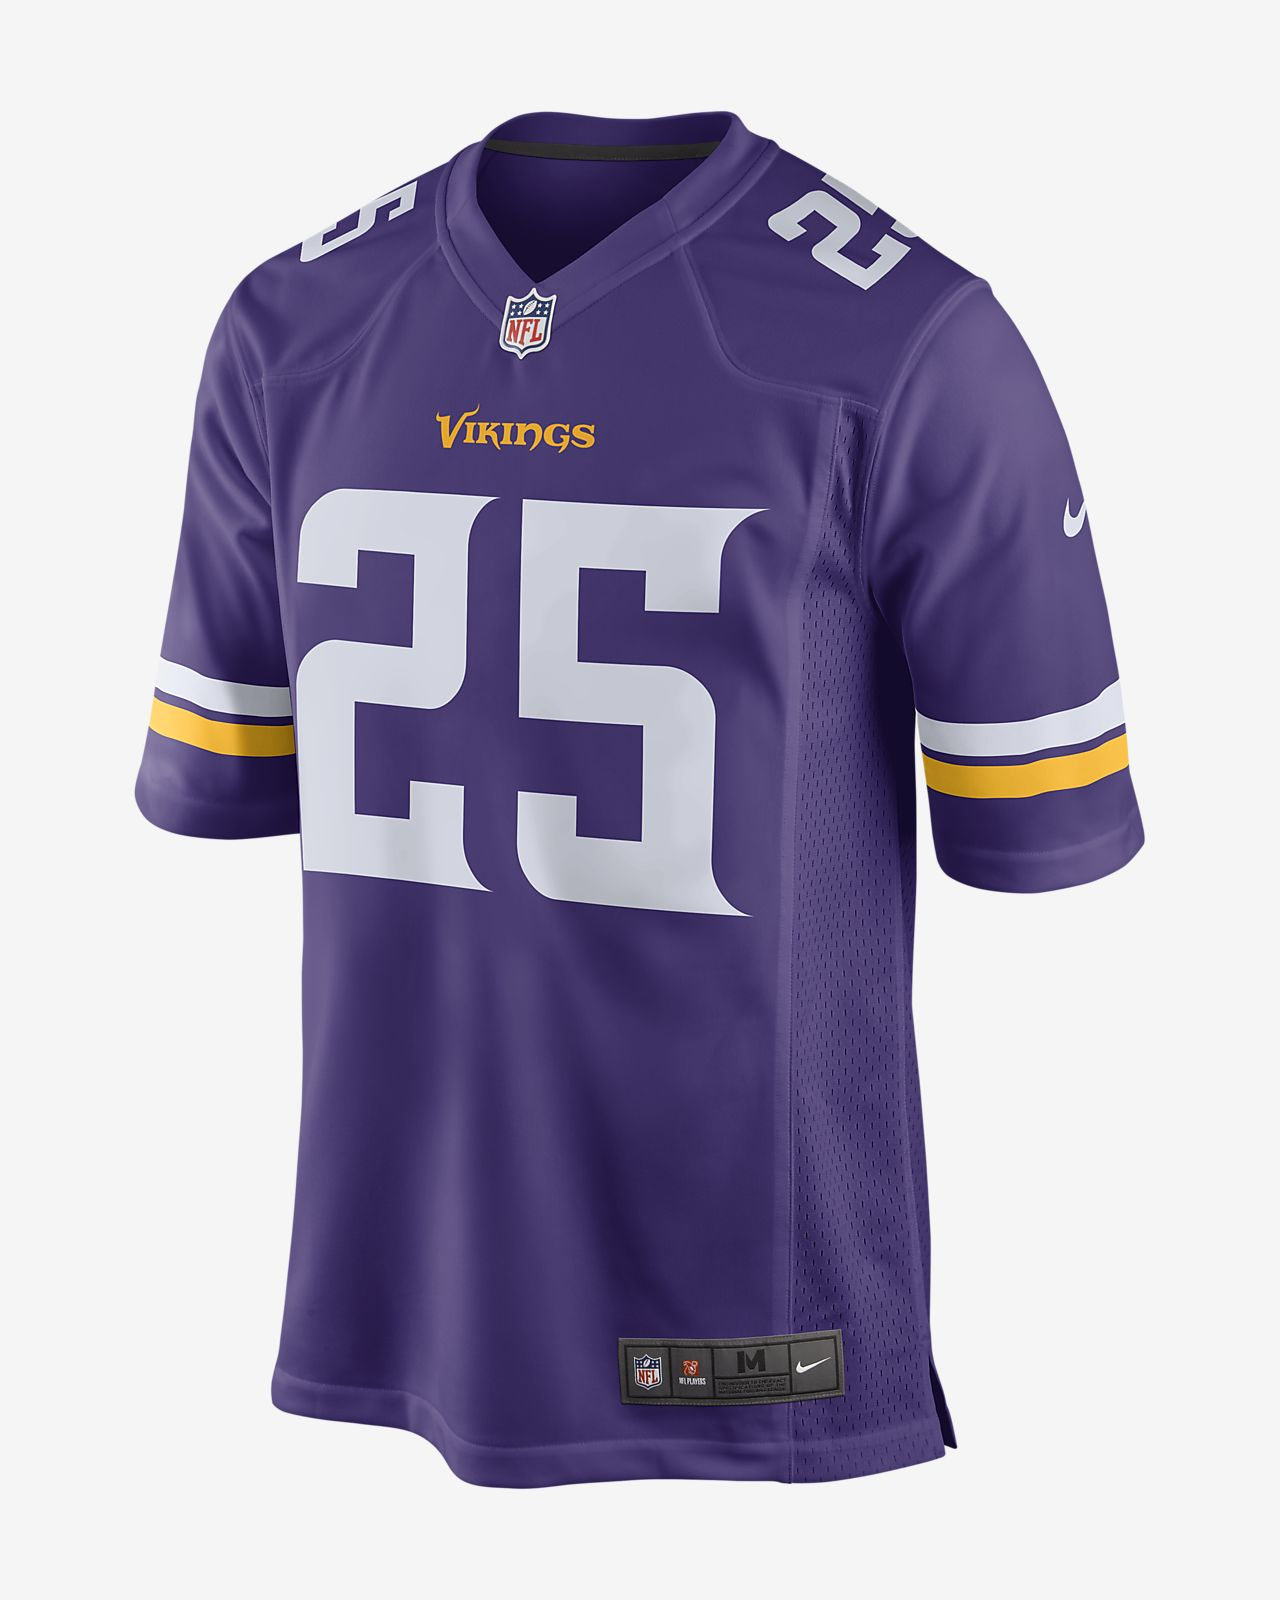 ... Camiseta de fútbol americano de local para hombre NFL Minnesota Vikings  (Latavius Murray) f22d6fd3a8d